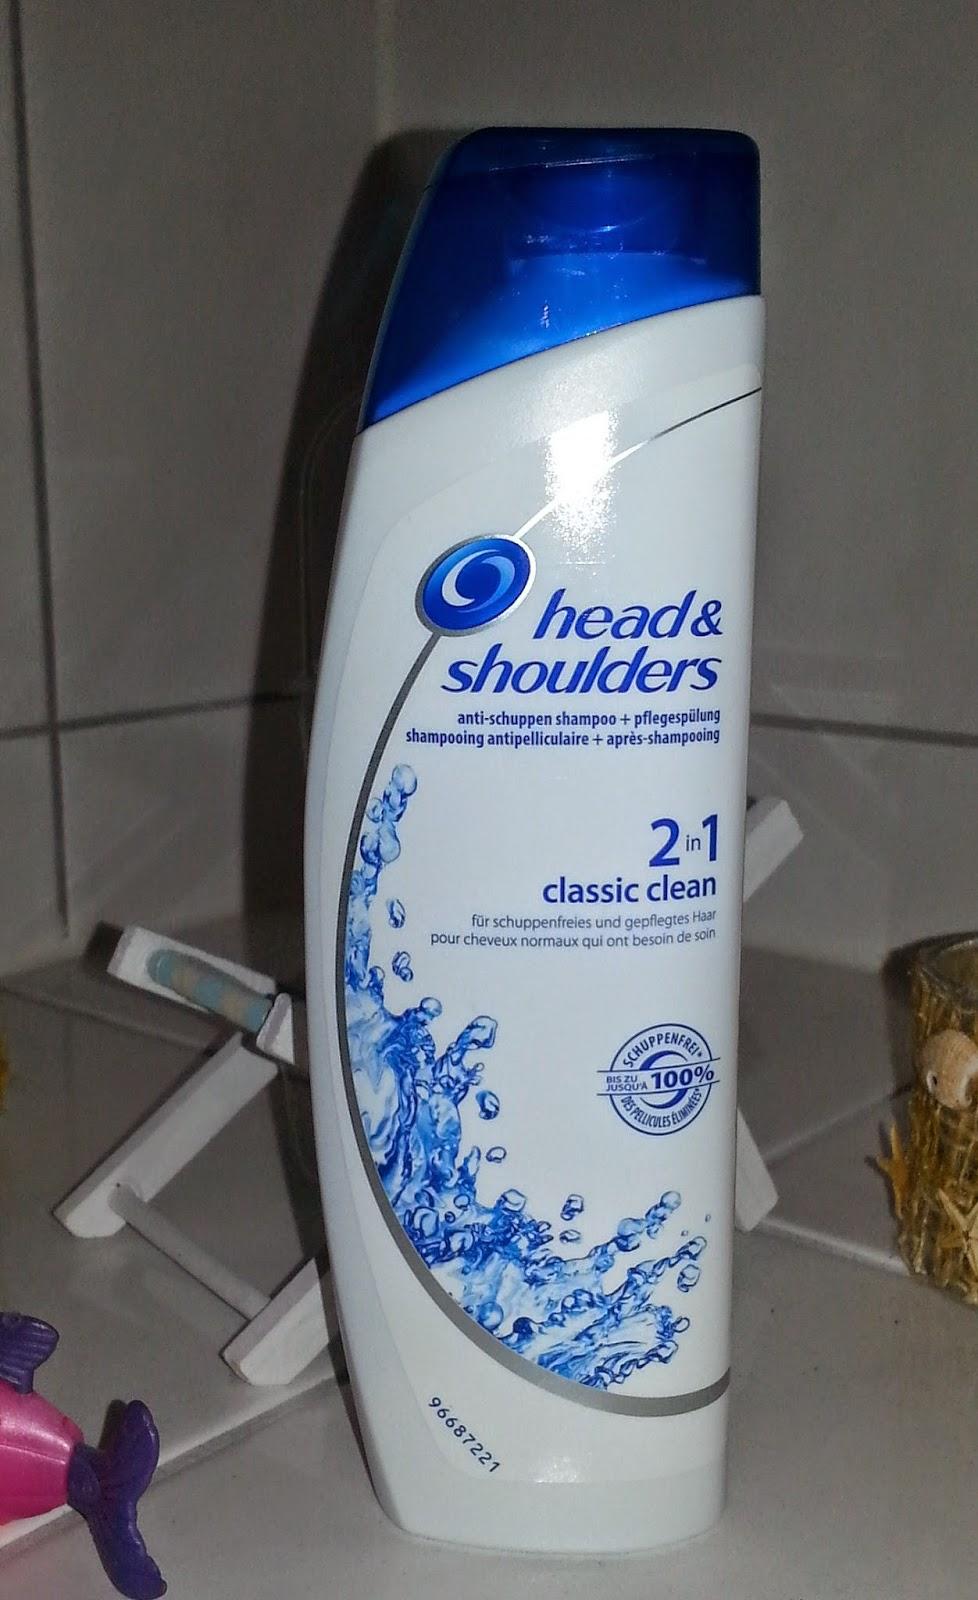 muttis produkttest blog head shoulders anti schuppen shampoo 2in1 classic clean. Black Bedroom Furniture Sets. Home Design Ideas